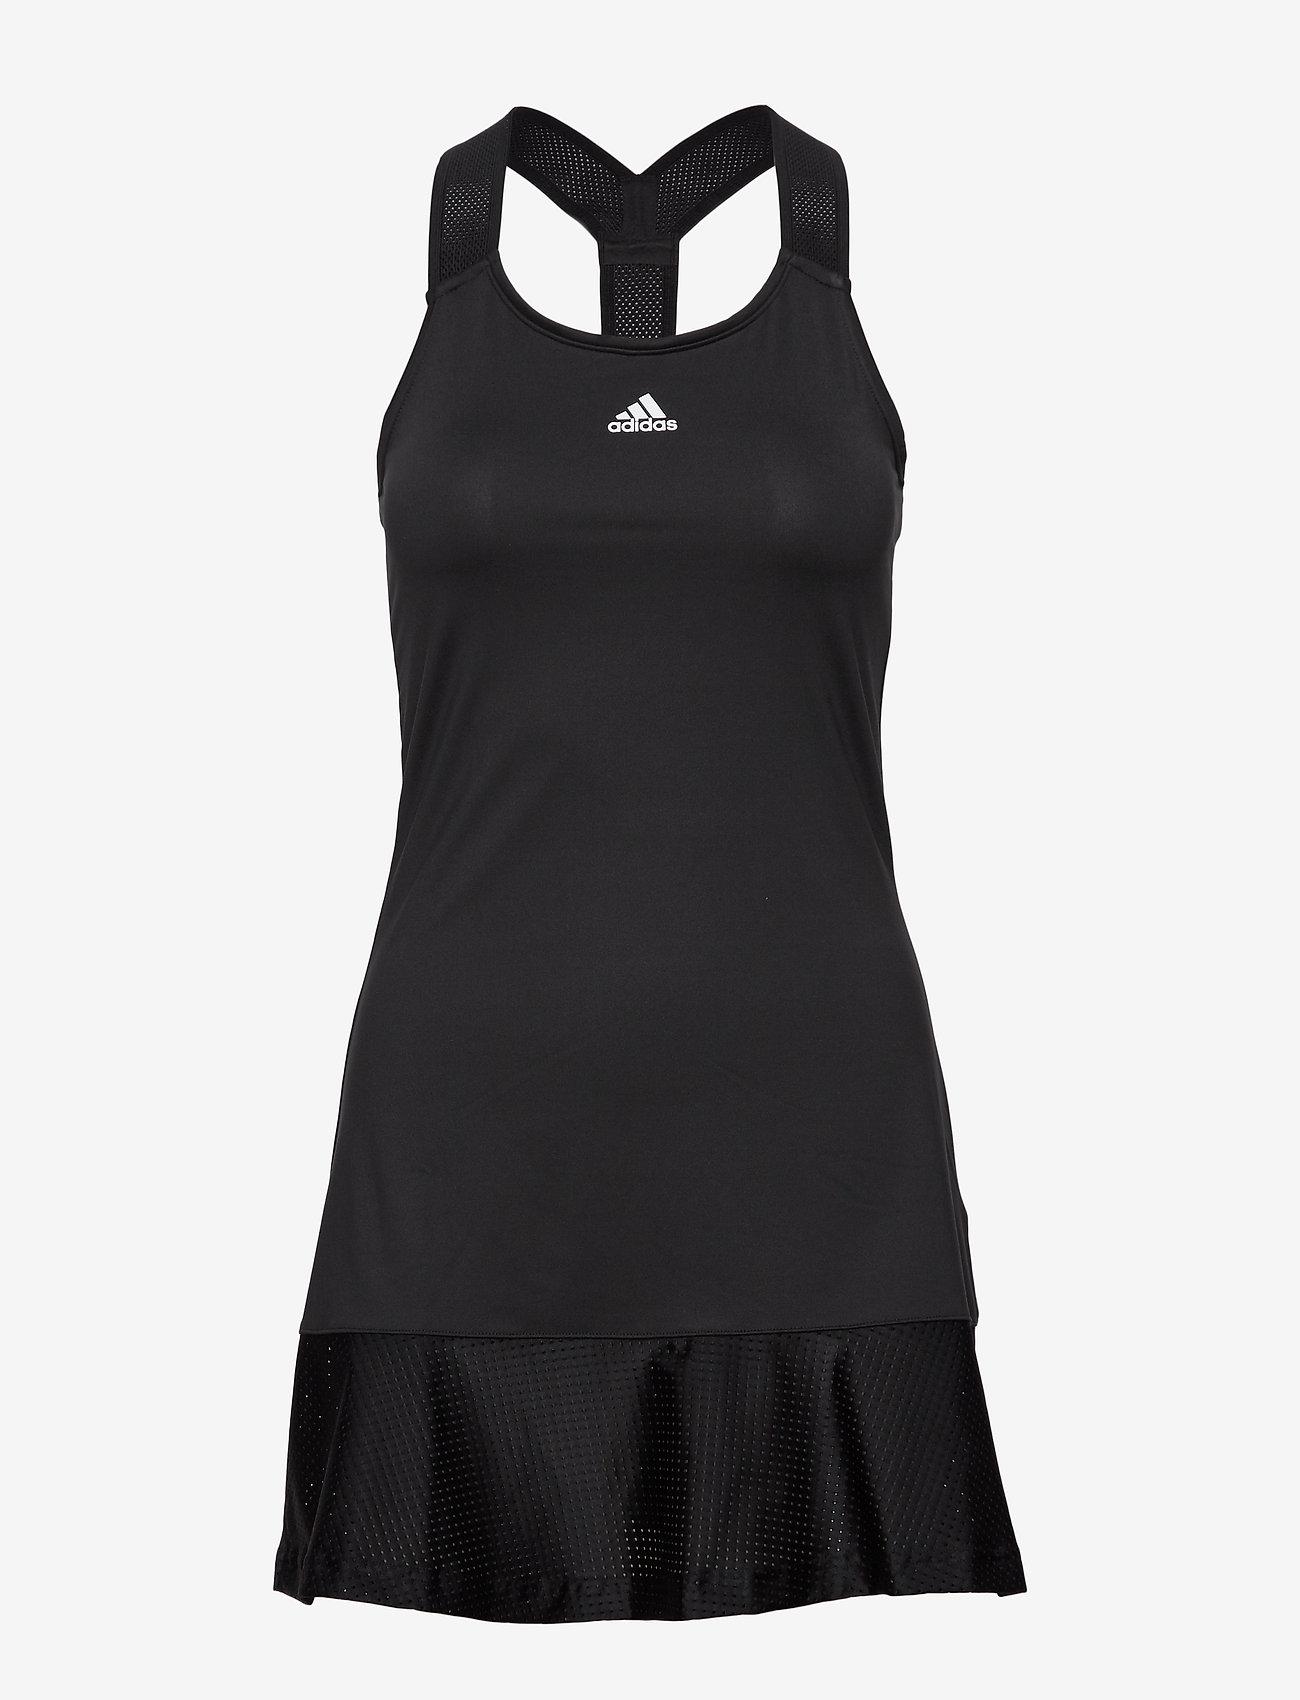 adidas Tennis - TENNIS Y-DRESS - urheilumekot - black